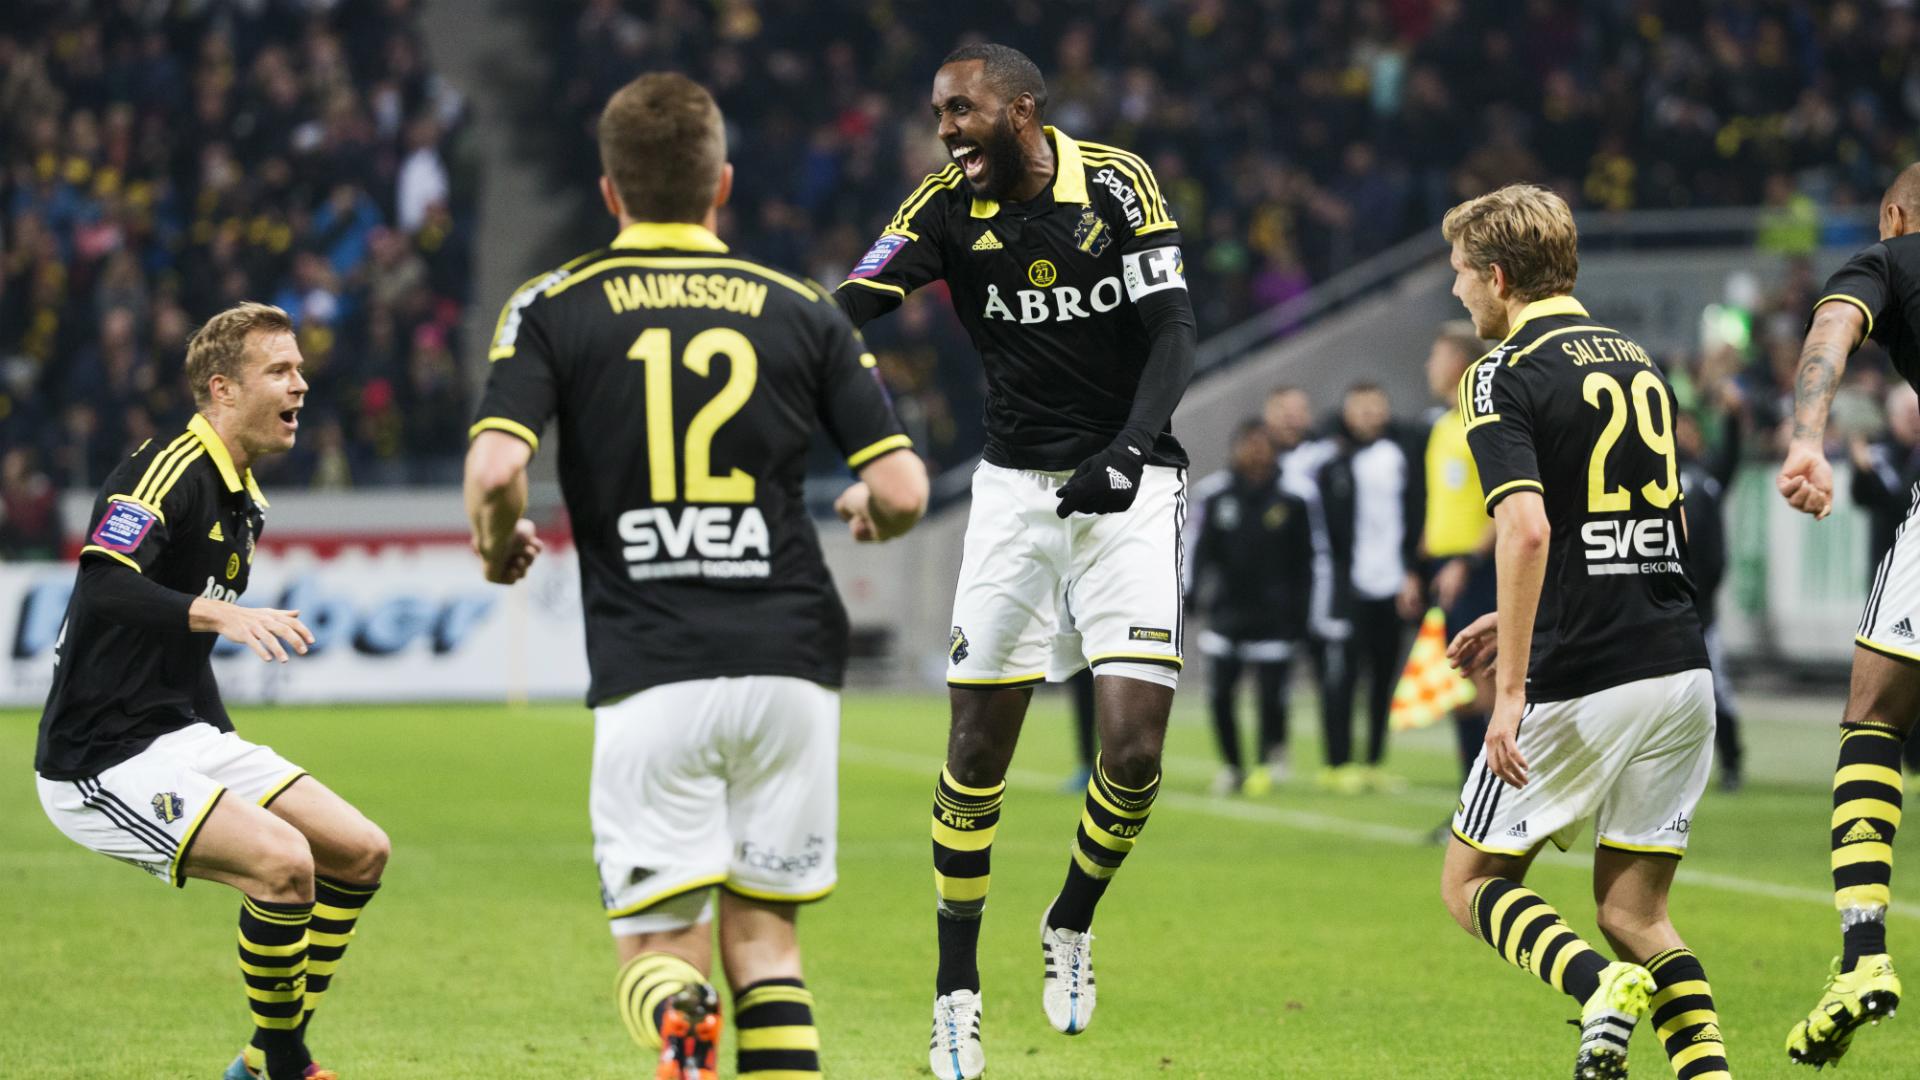 Scommesse, Svezia: rinviato match tra Goteborg e AIK per tentata combine